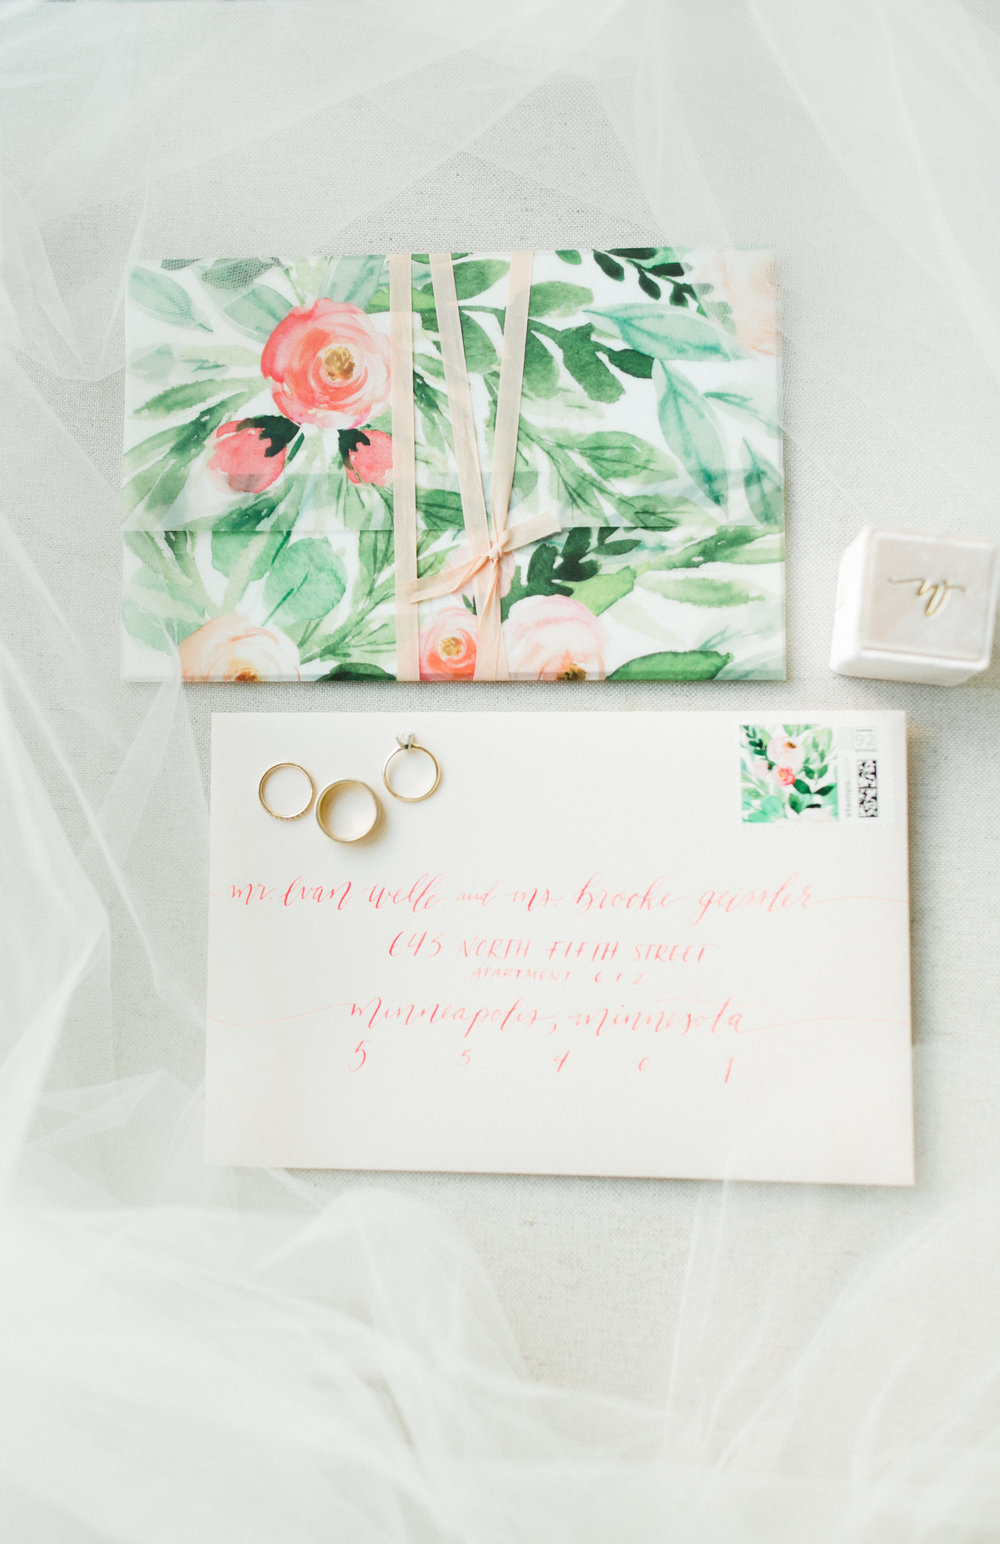 Champagne Press Custom Wedding Invitation Hooked Calligraphy Envelope